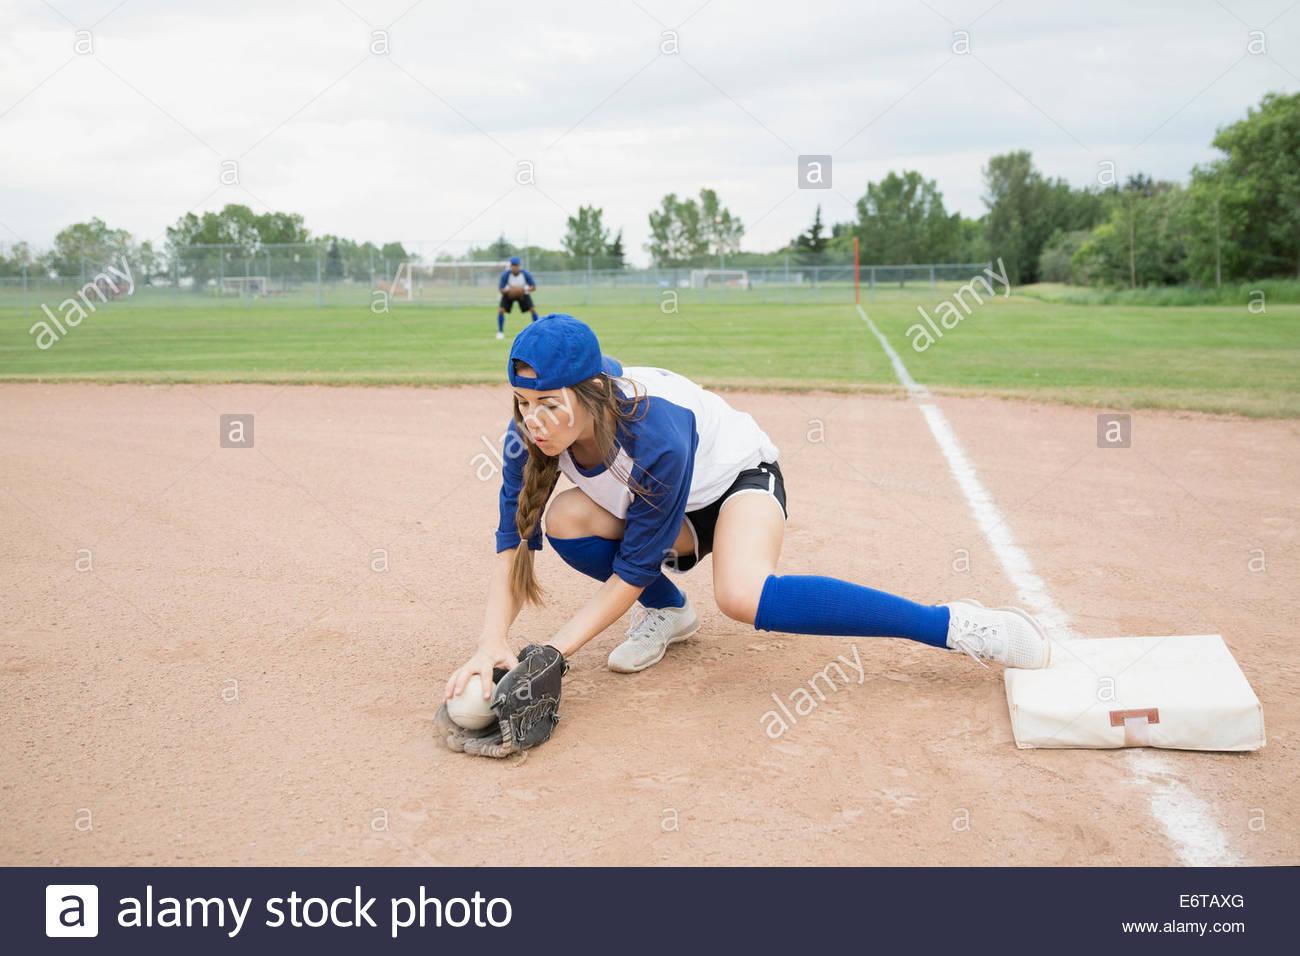 Baseball player scooping up ball at base - Stock Image